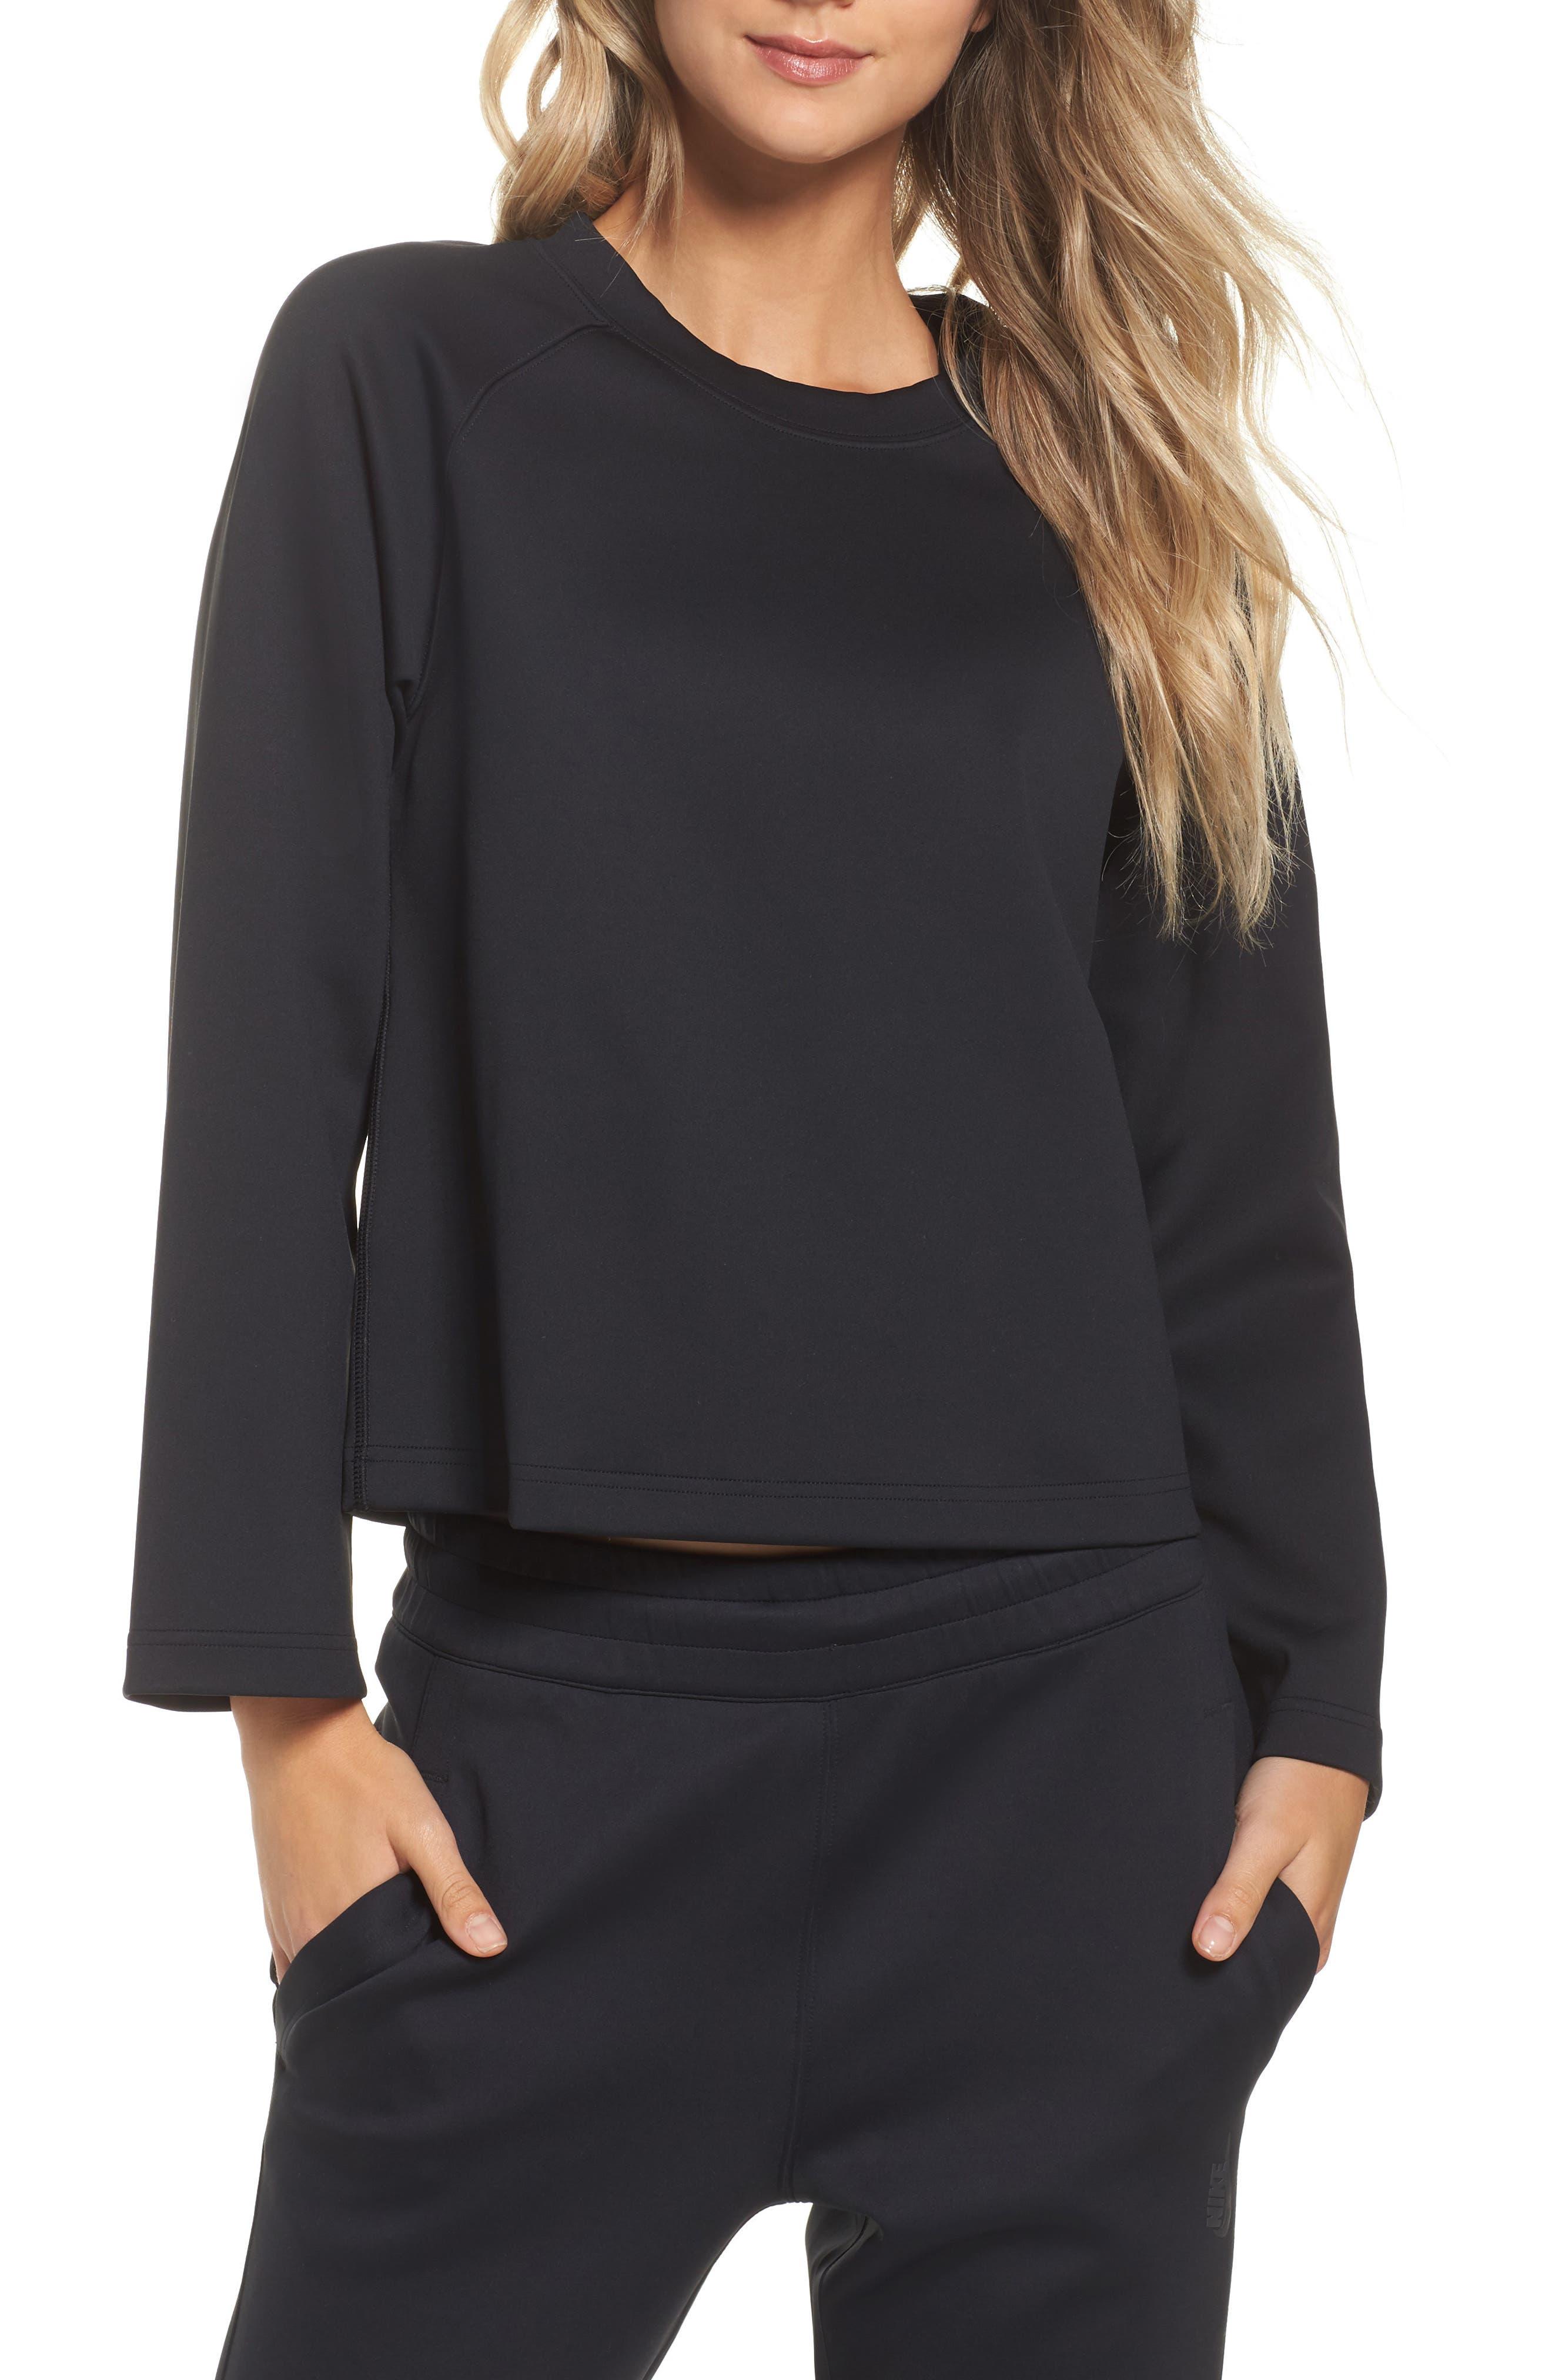 NikeLab Essentials Women's Fleece Top,                             Main thumbnail 1, color,                             010